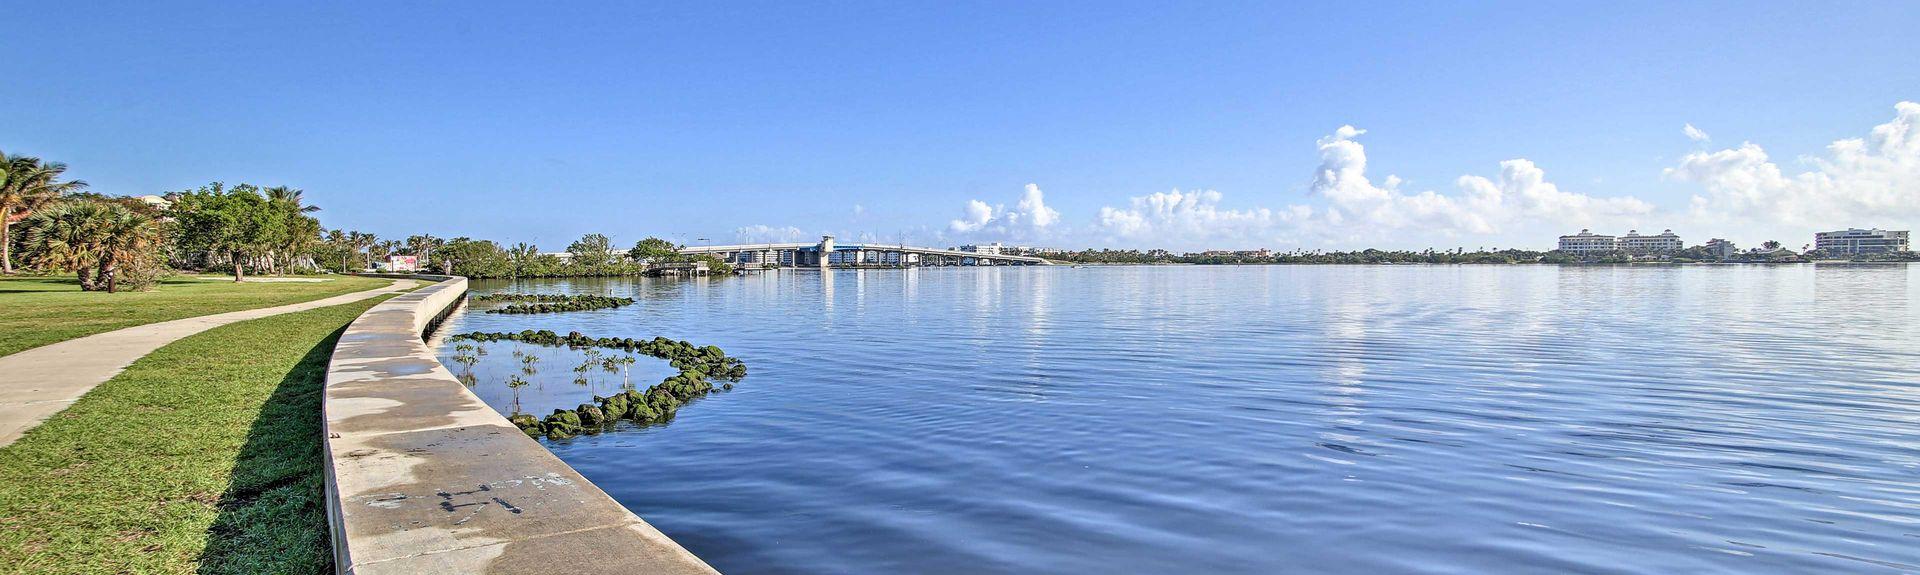 Mango Groves, Lake Worth, FL, USA